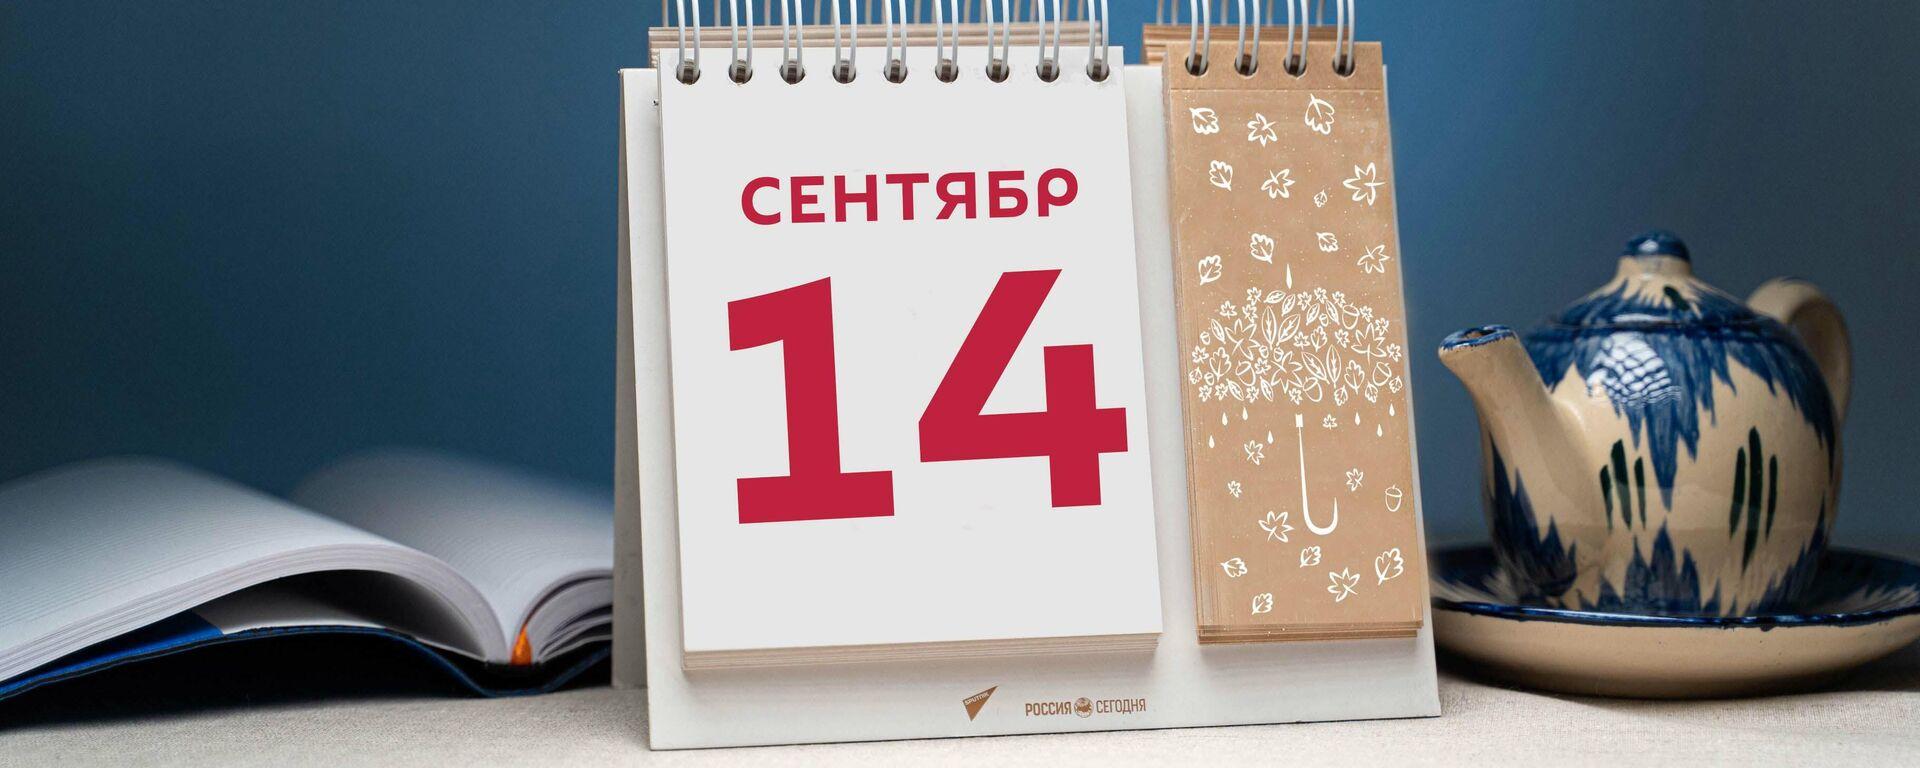 День 14 сентября - Sputnik Тоҷикистон, 1920, 14.09.2021